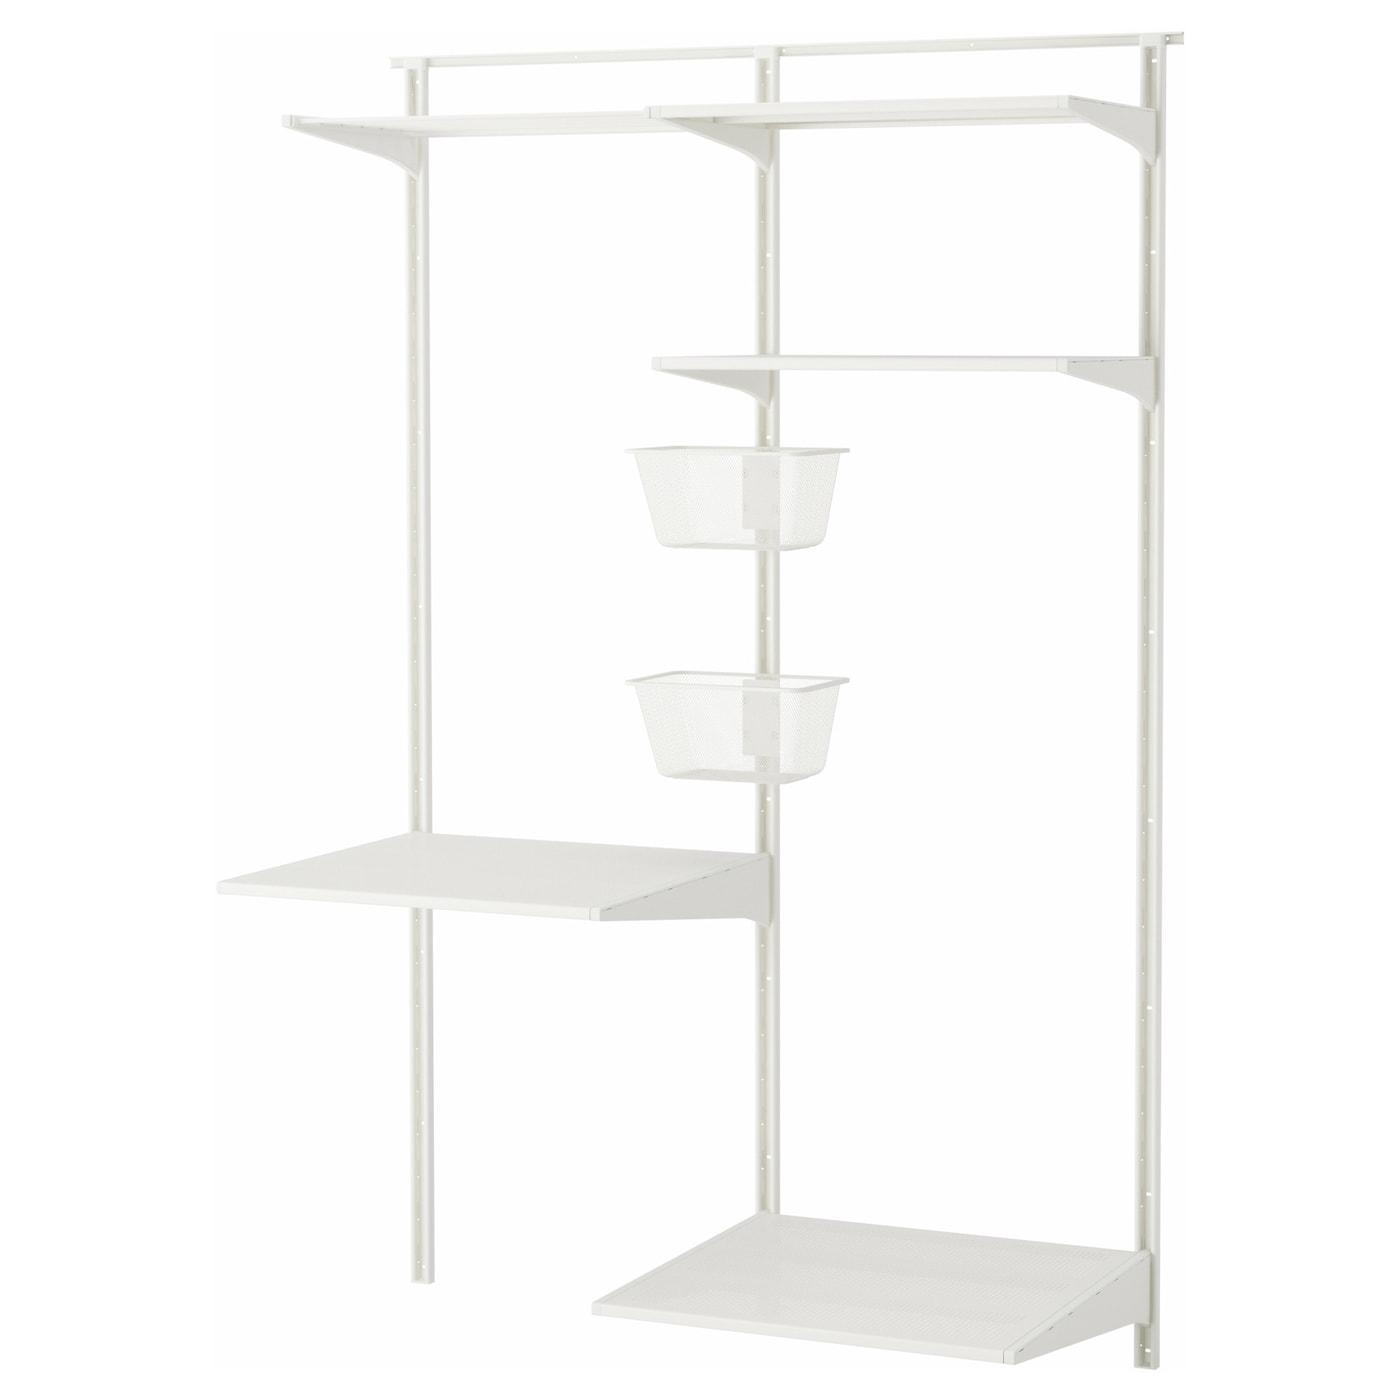 Algot wall upright shelves drying rack metal white for Ikea metal wall shelf